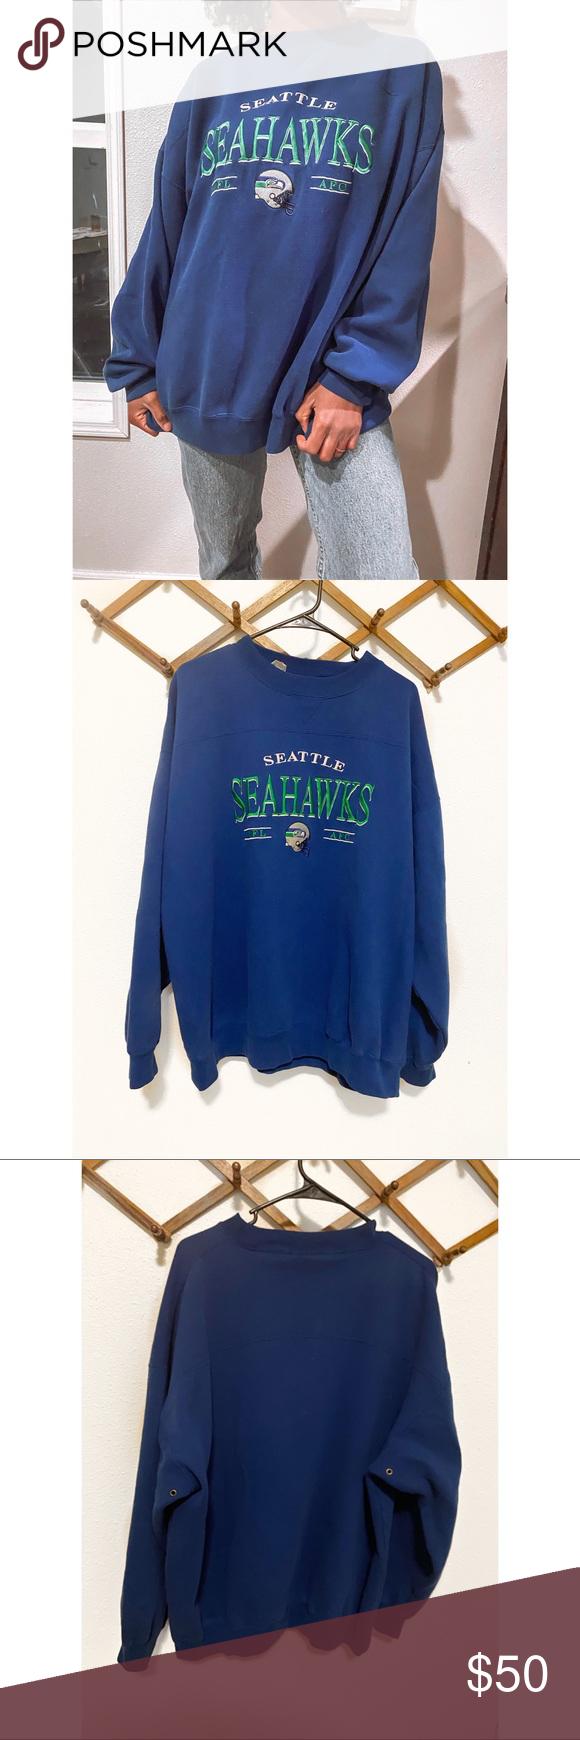 Predownload: Vintage Seattle Seahawks Crewneck Sweatshirt Sweatshirts Crew Neck Sweatshirt Nfl Outfits [ 1740 x 580 Pixel ]